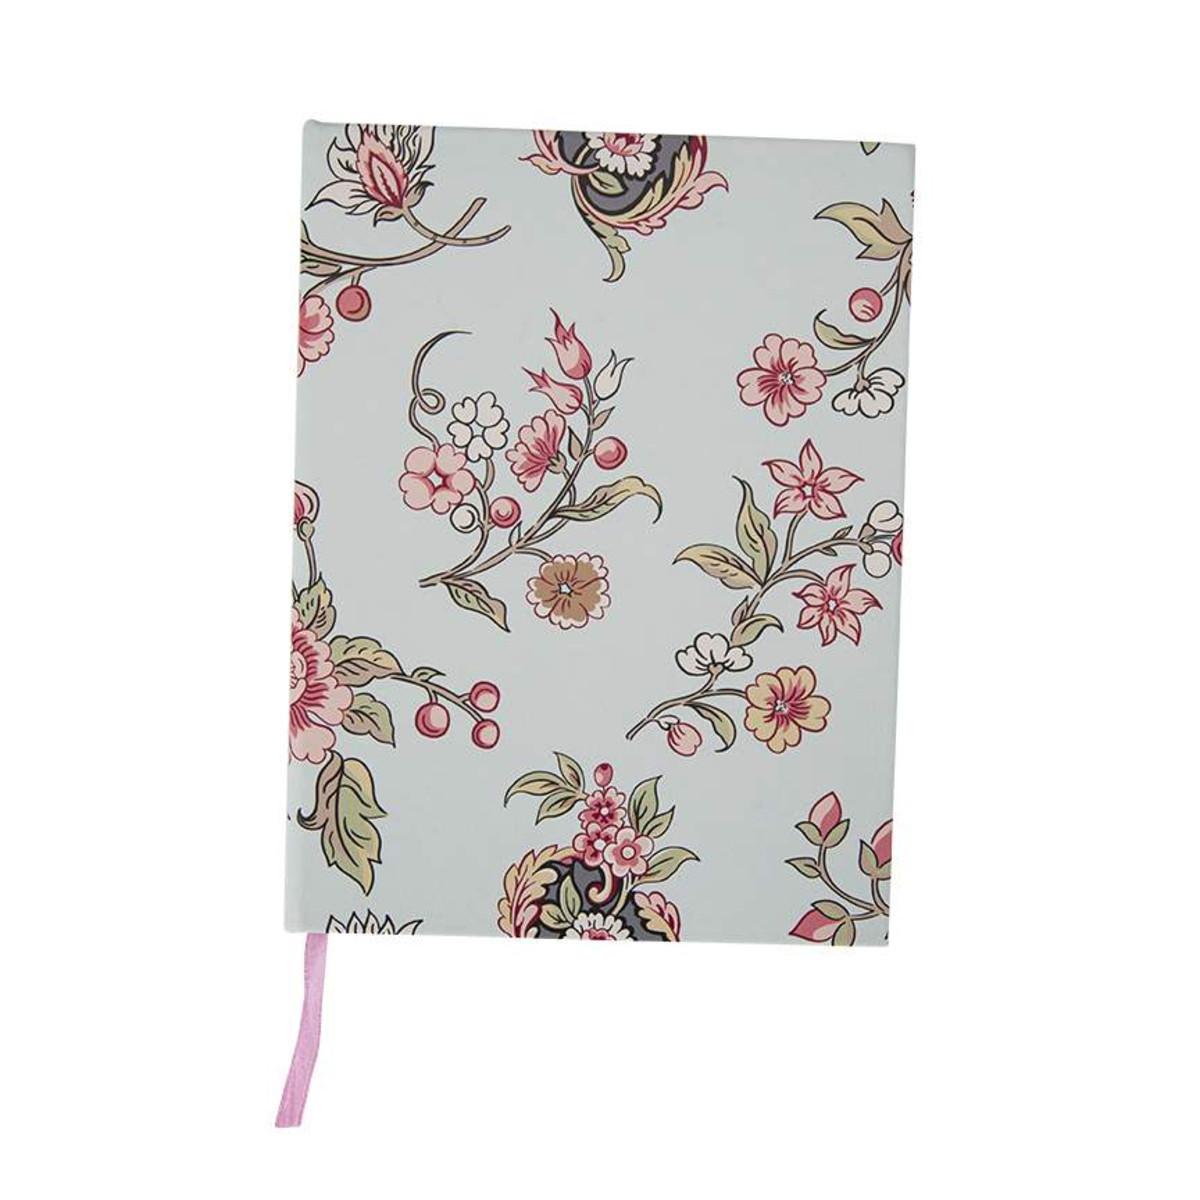 Riley Blake Jane Austen Journal - Cassandra